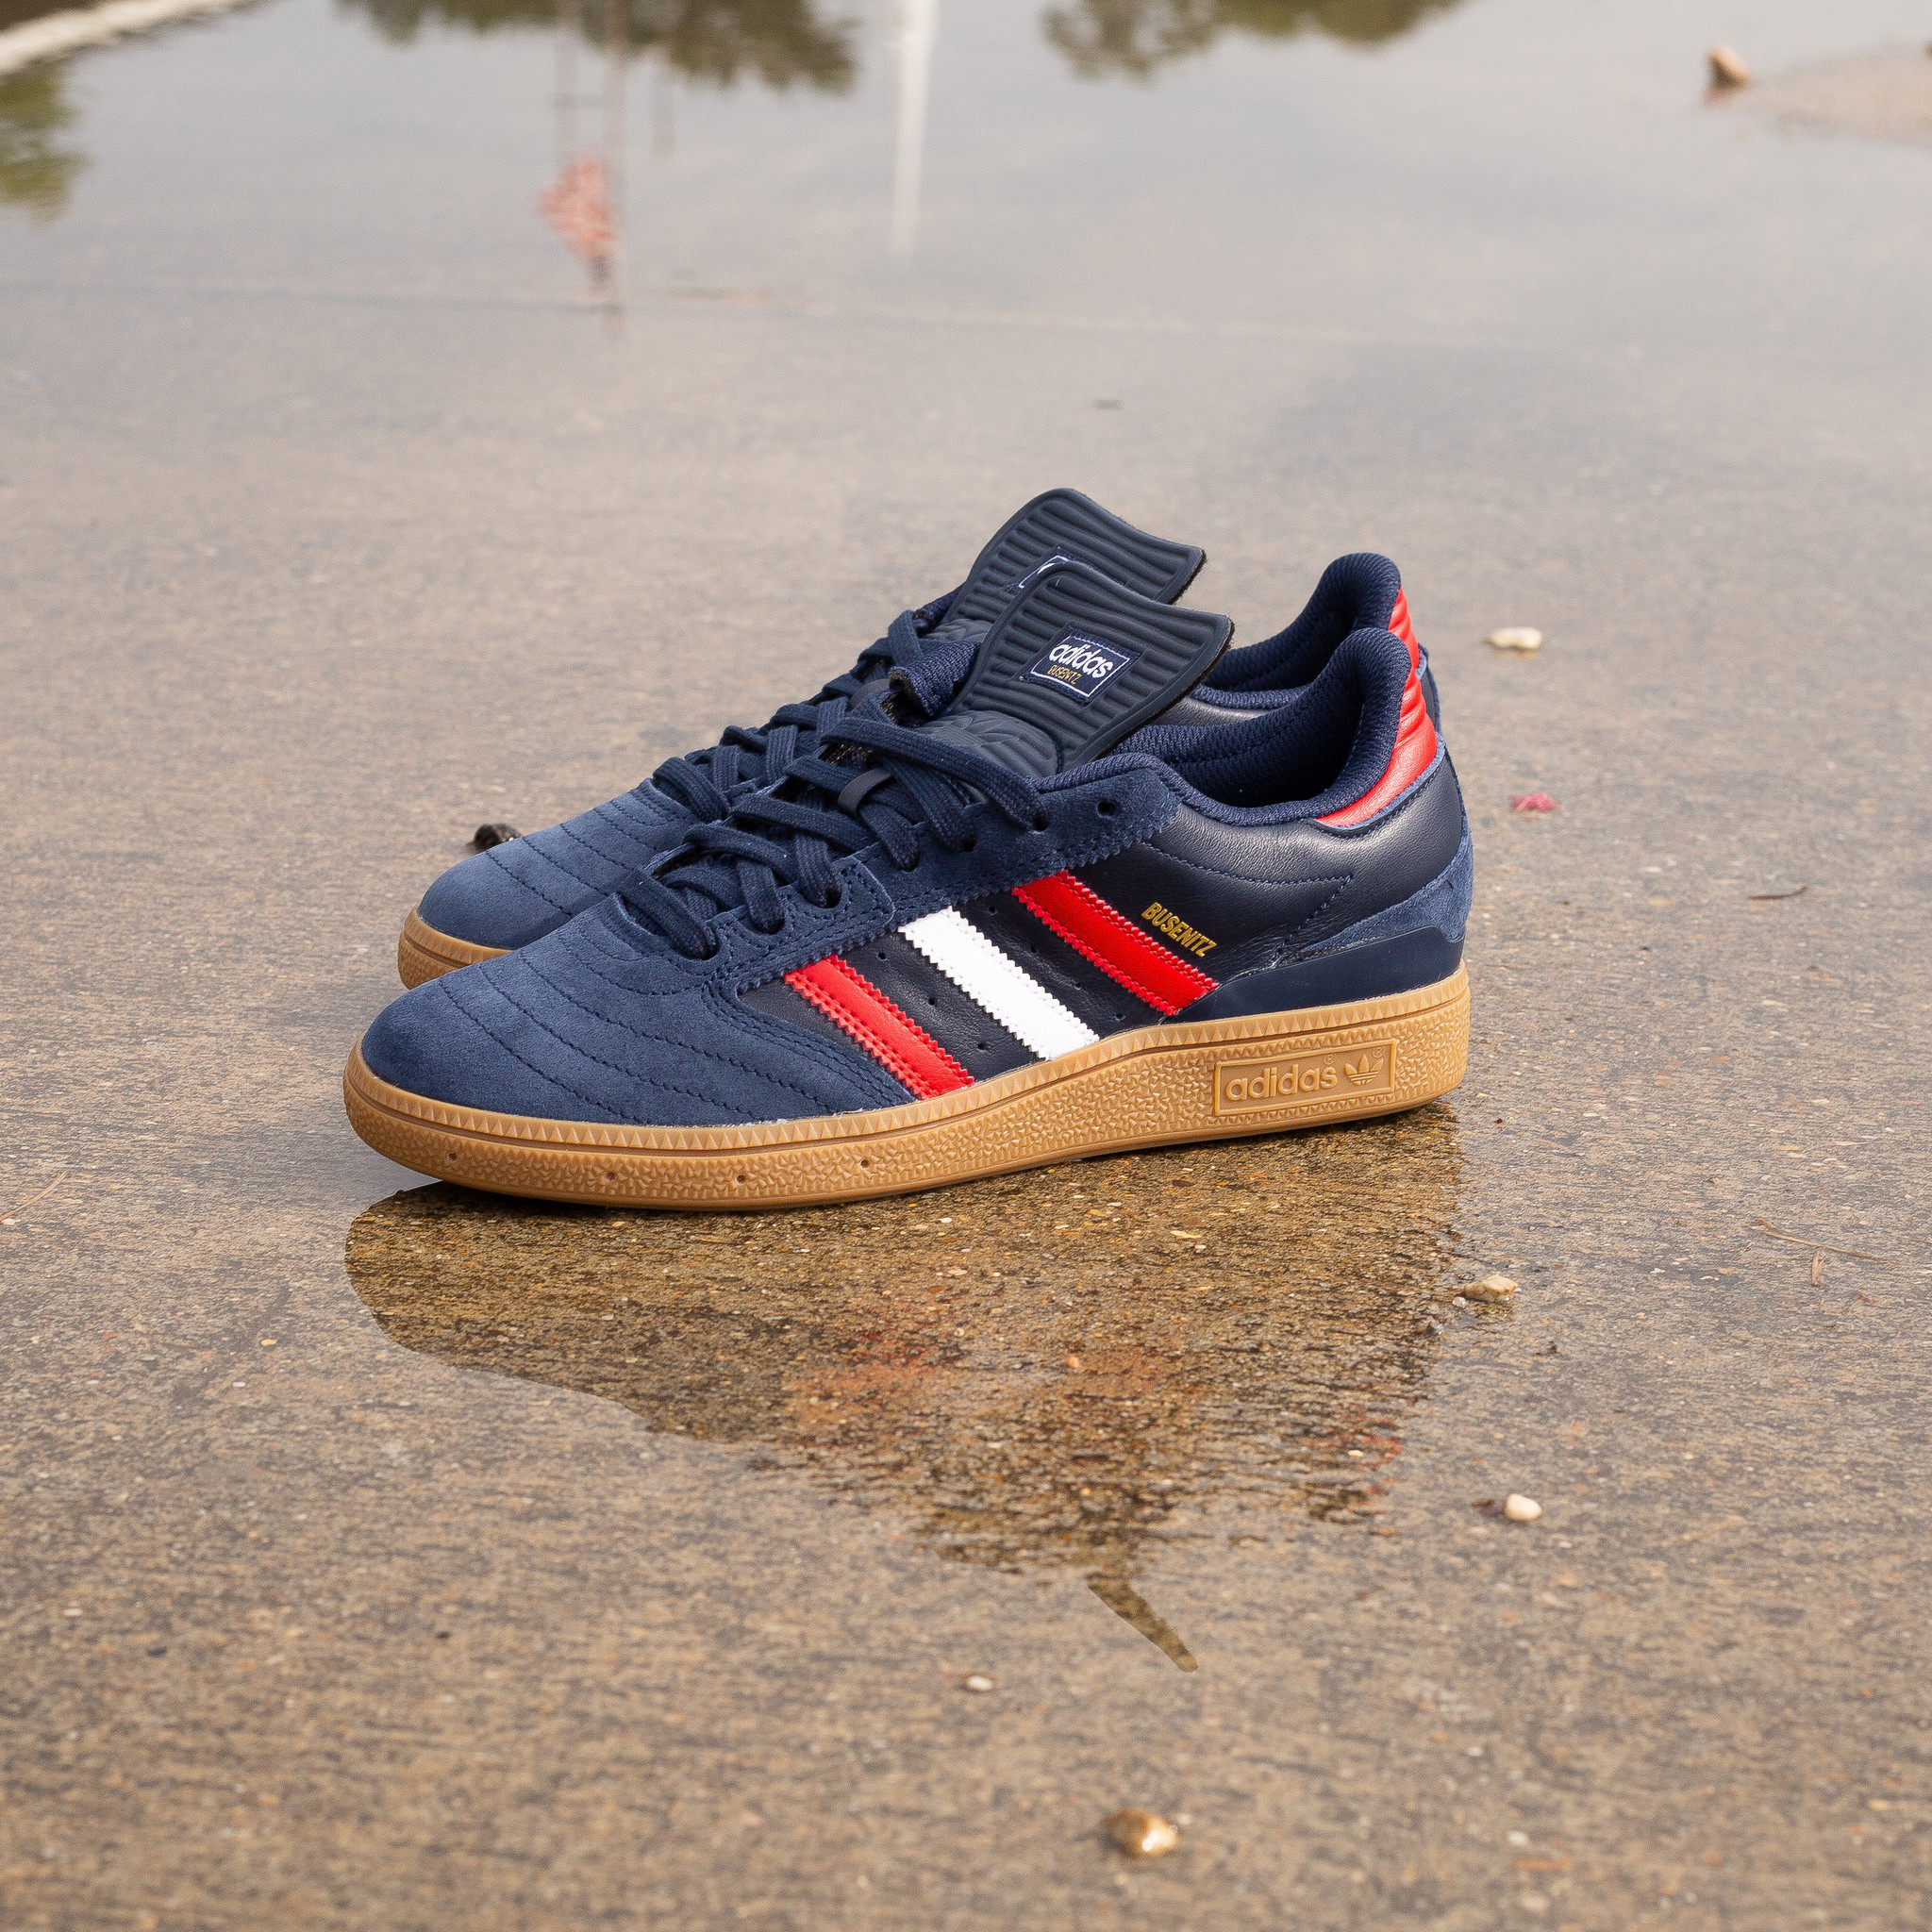 adidas Busenitz Navy/Red/Gum